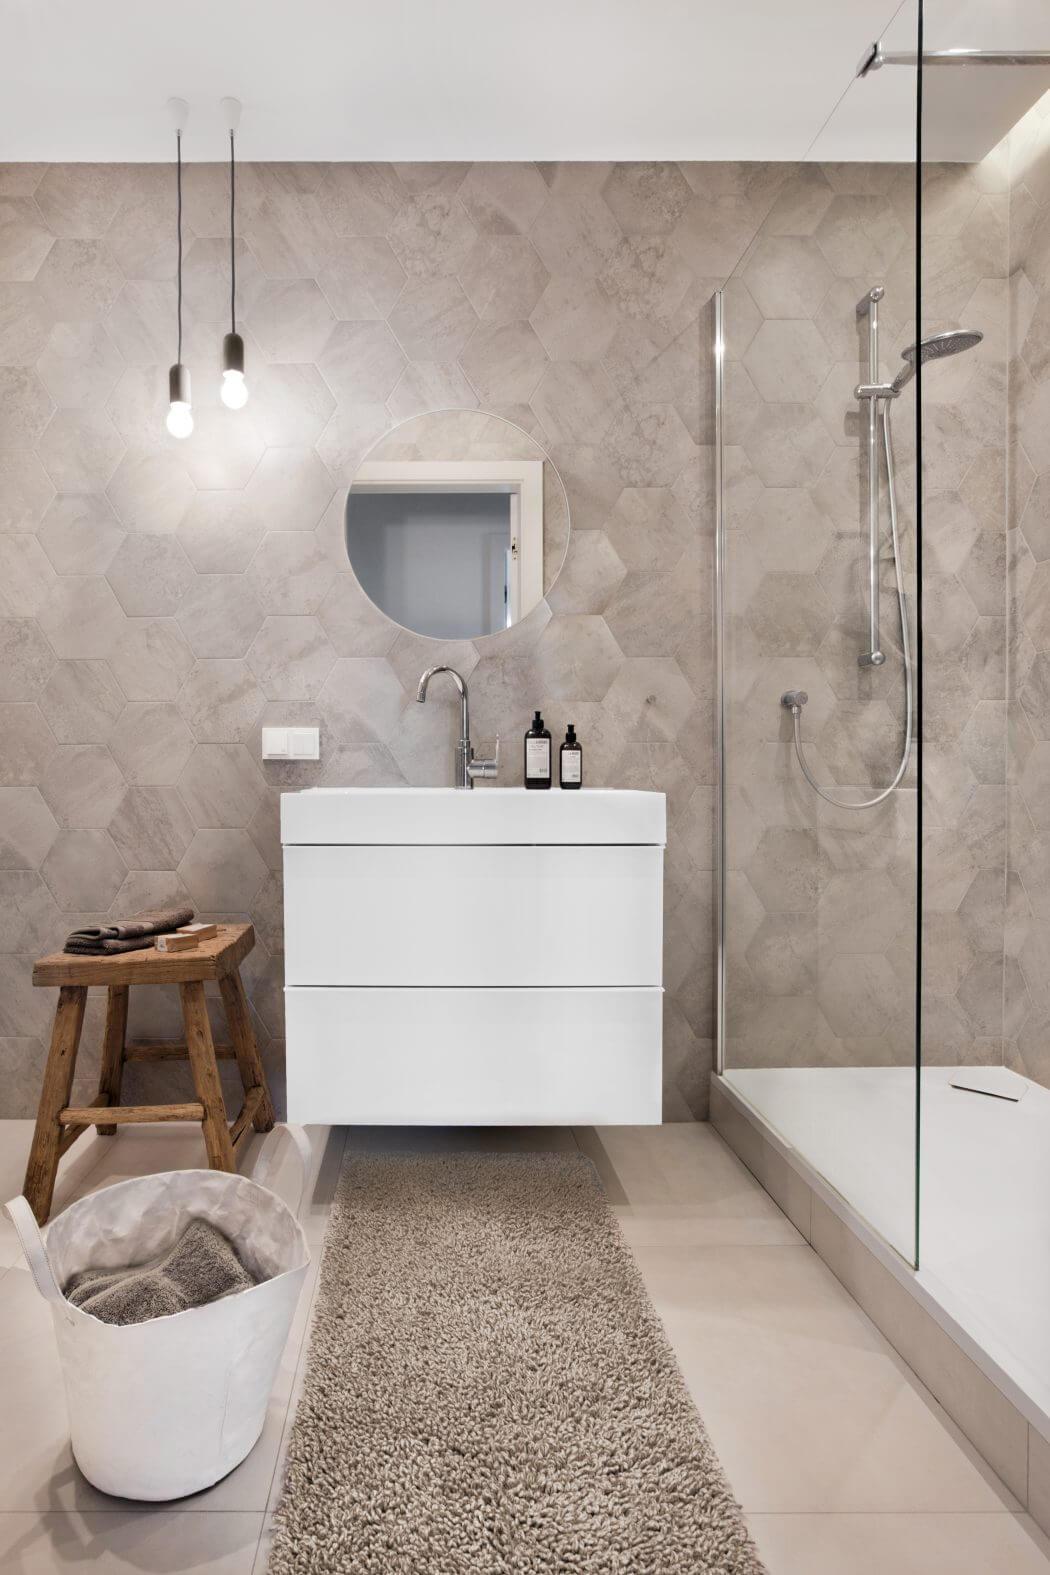 012-scandinavian-apartment-agnieszka-kara-1050x1575.jpg